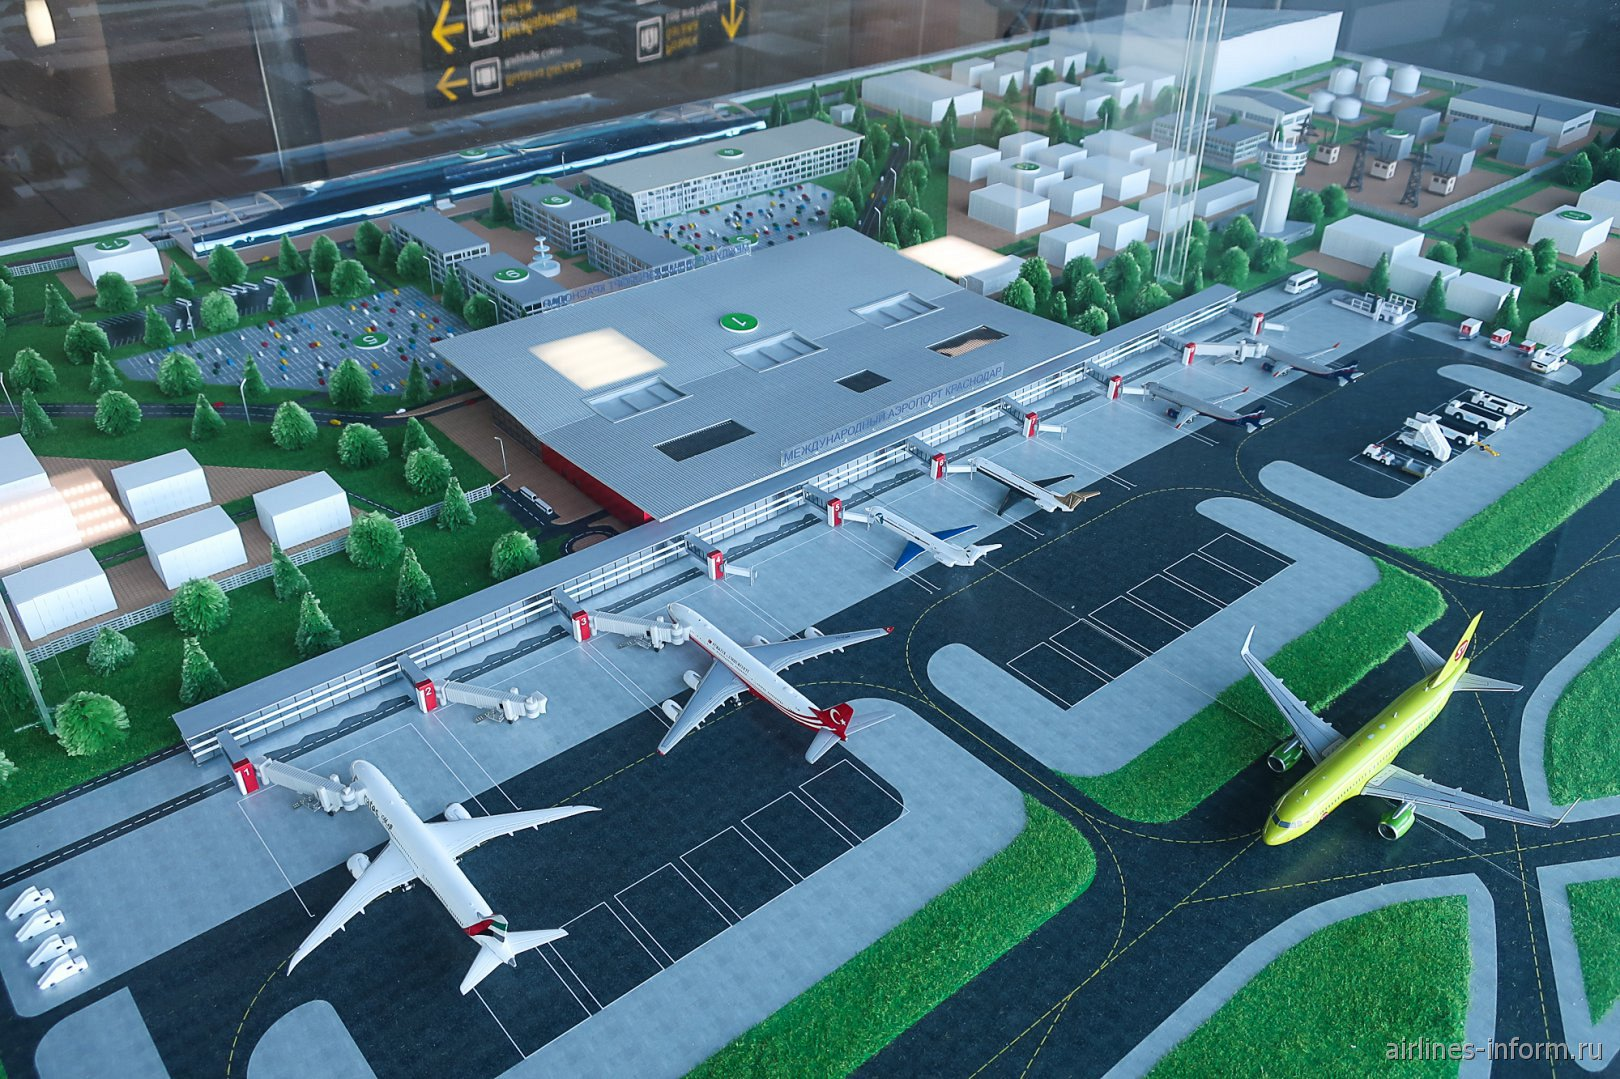 Макет нового пассажирского терминала аэропорта Краснодар Пашковский